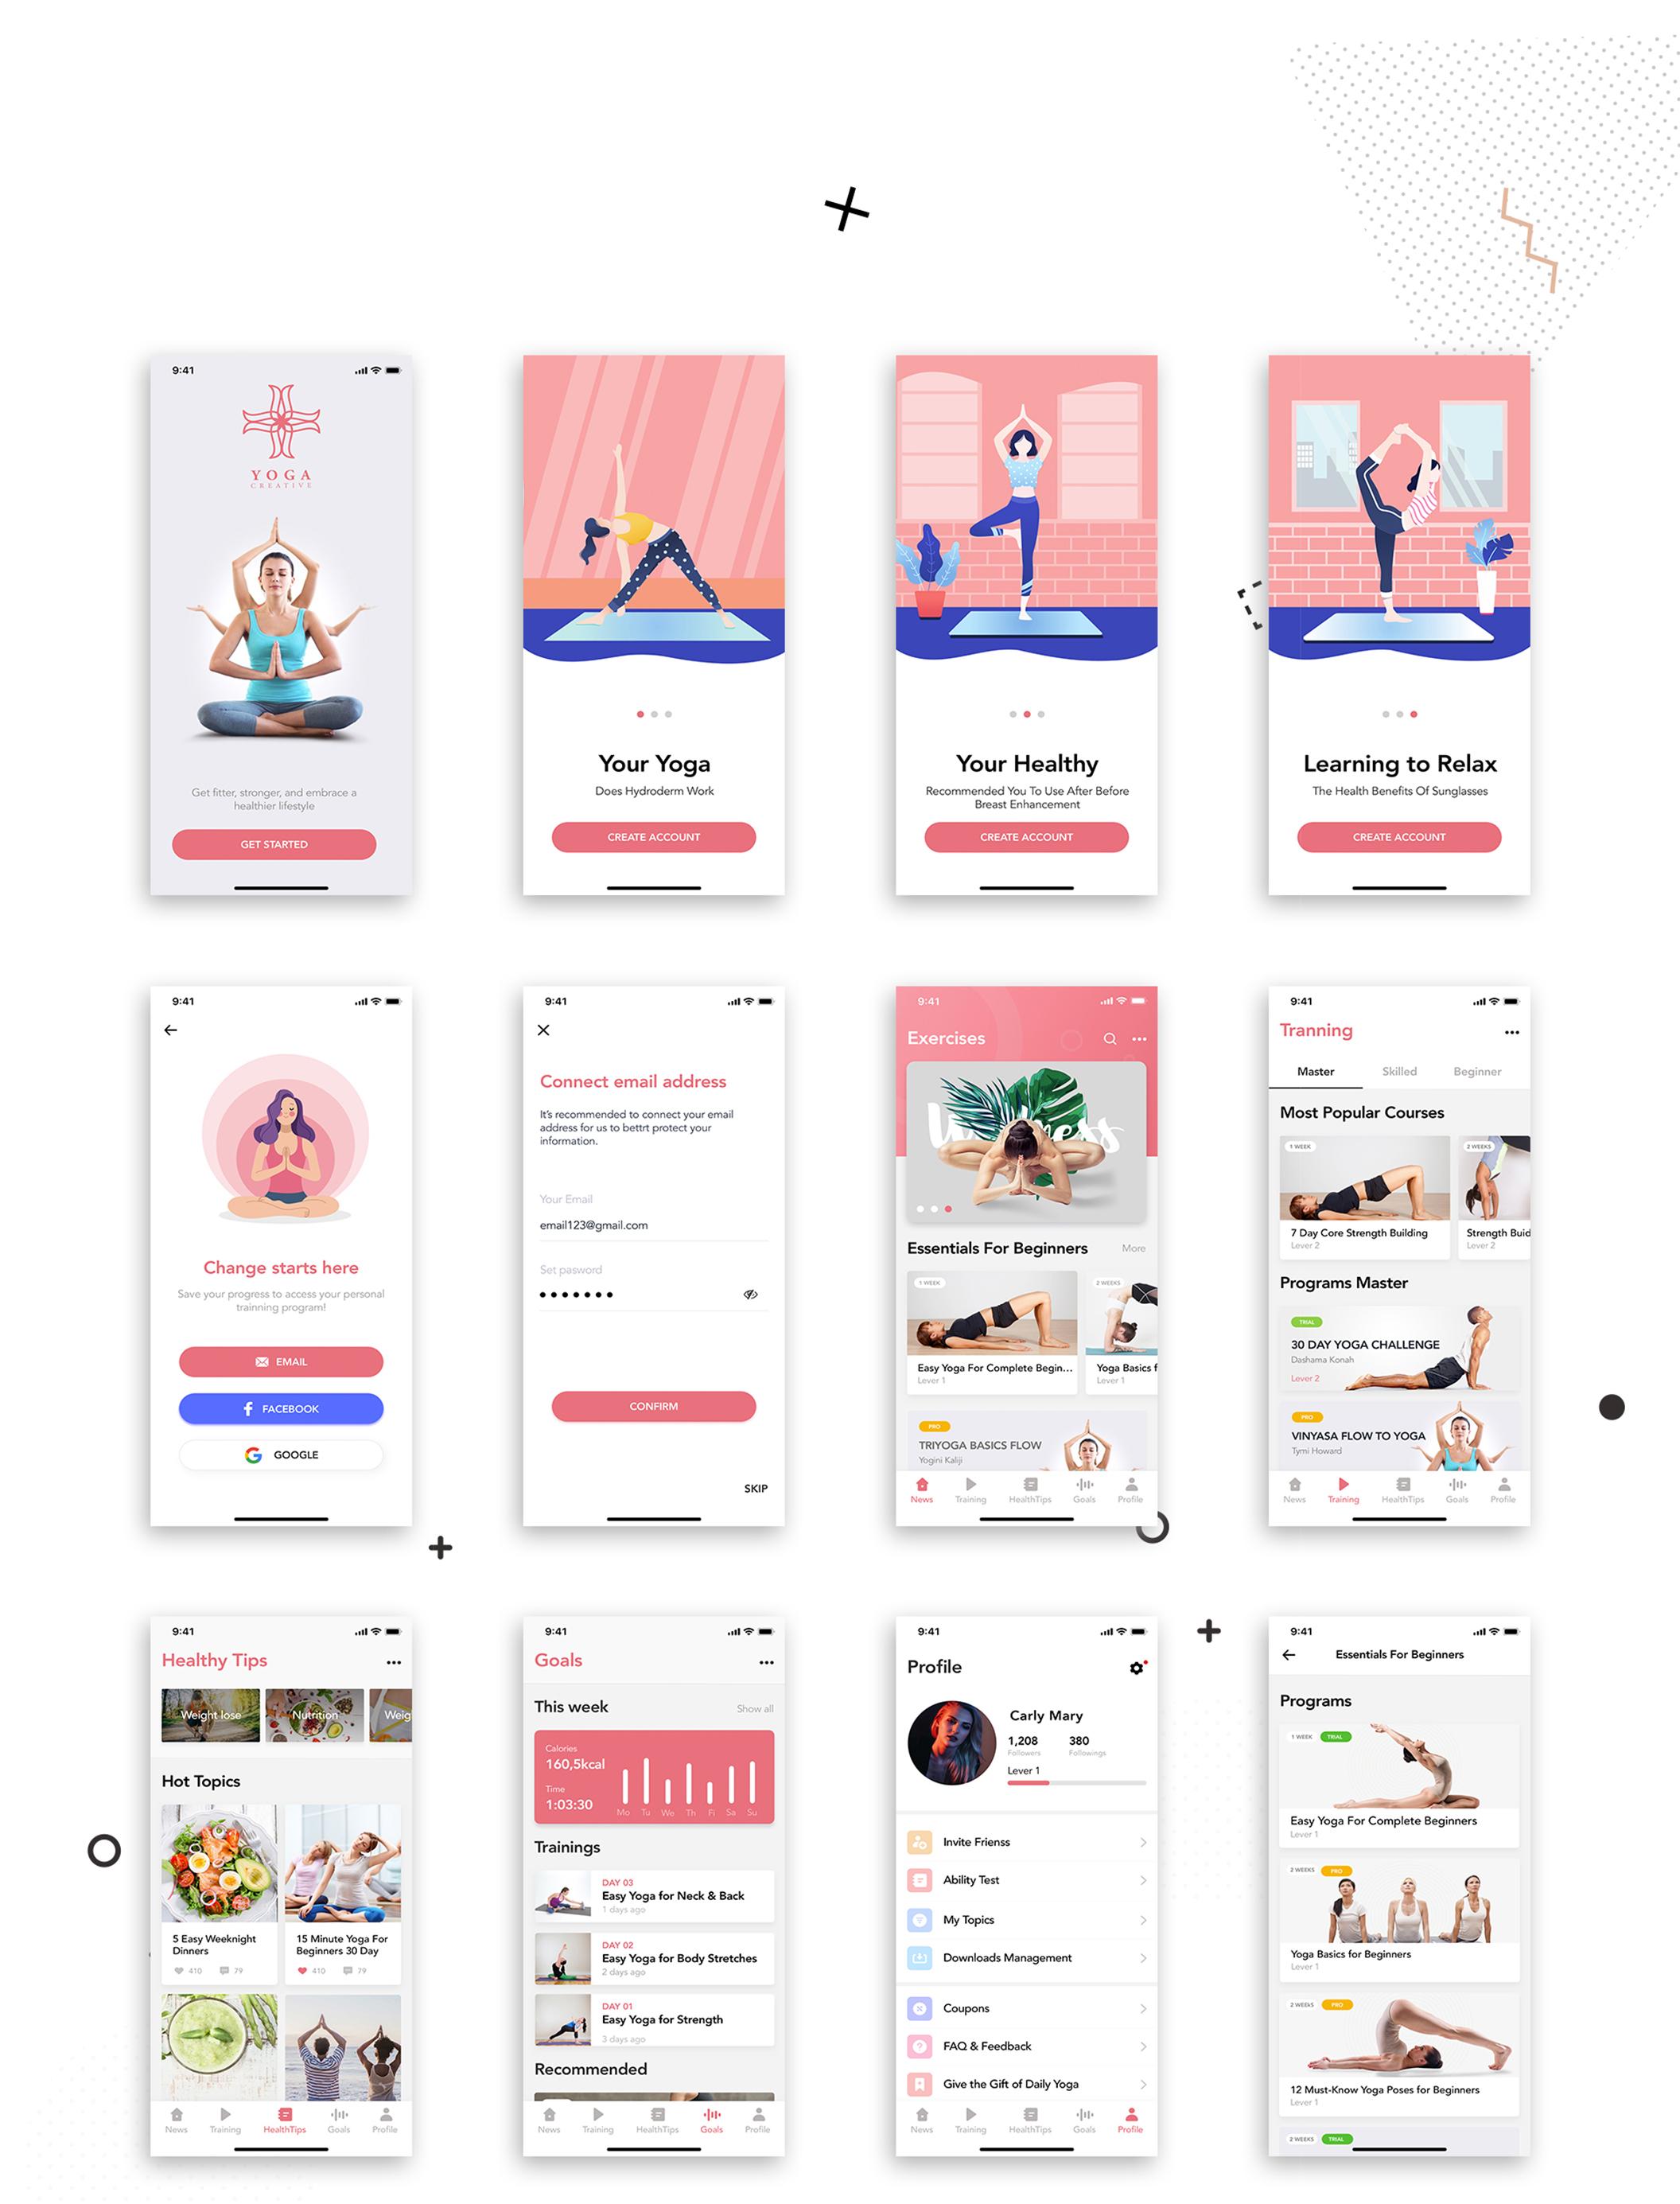 瑜伽健身应用程序APP界面设计UI套件 Yoga Fitness Mobile App UI Kit插图(4)